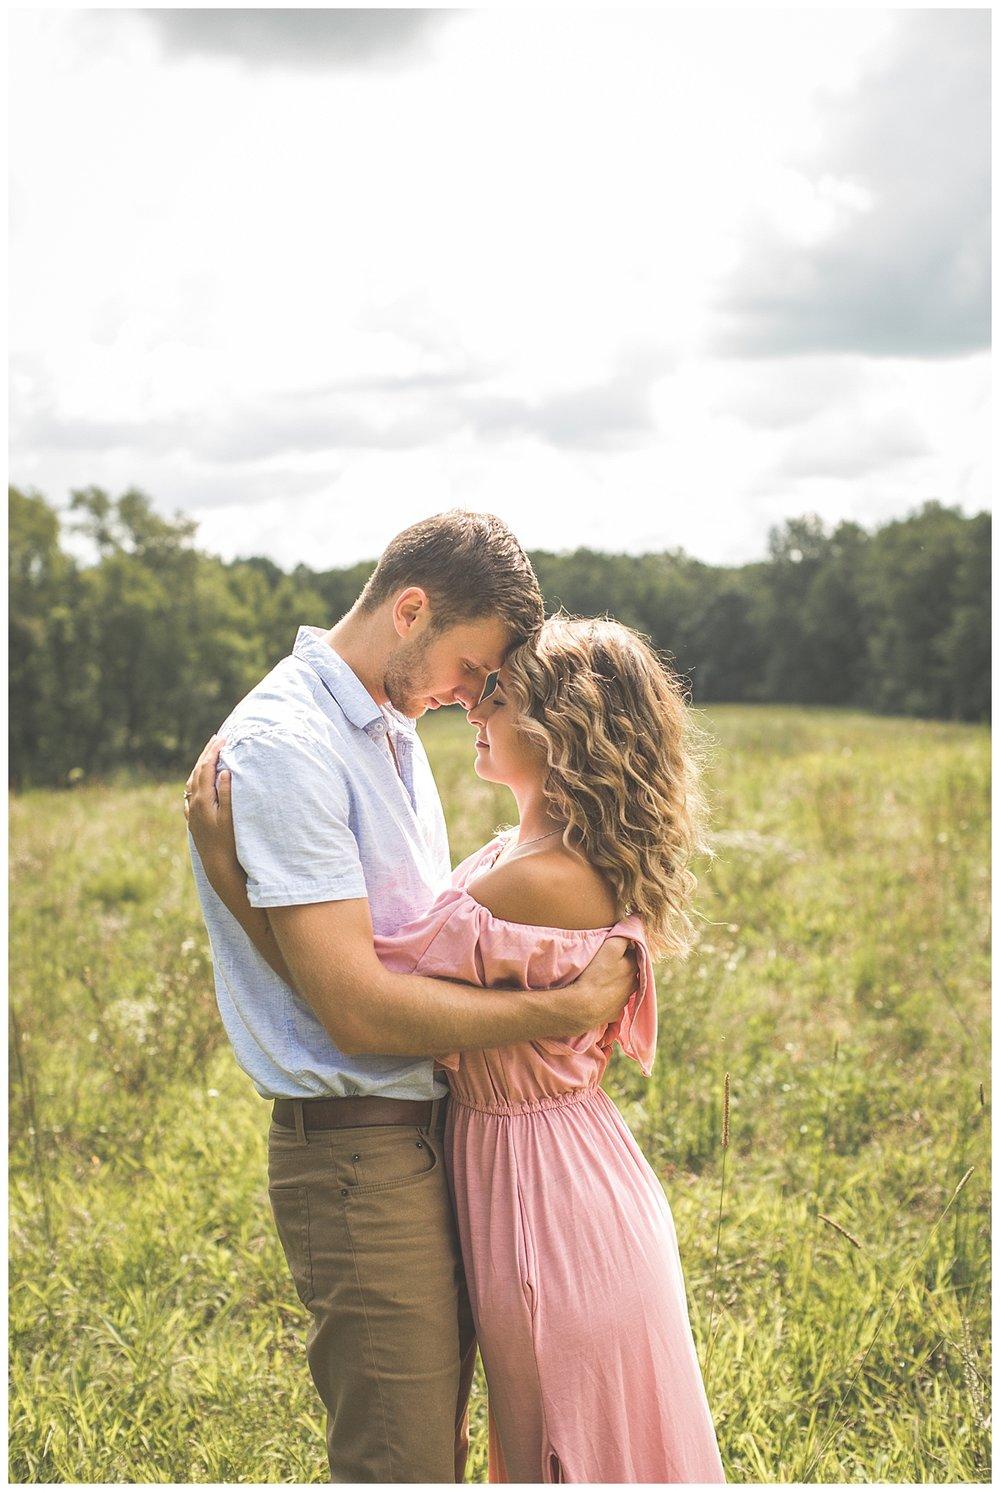 20180728-KaylaTyler-Engagement-blog-23.jpg